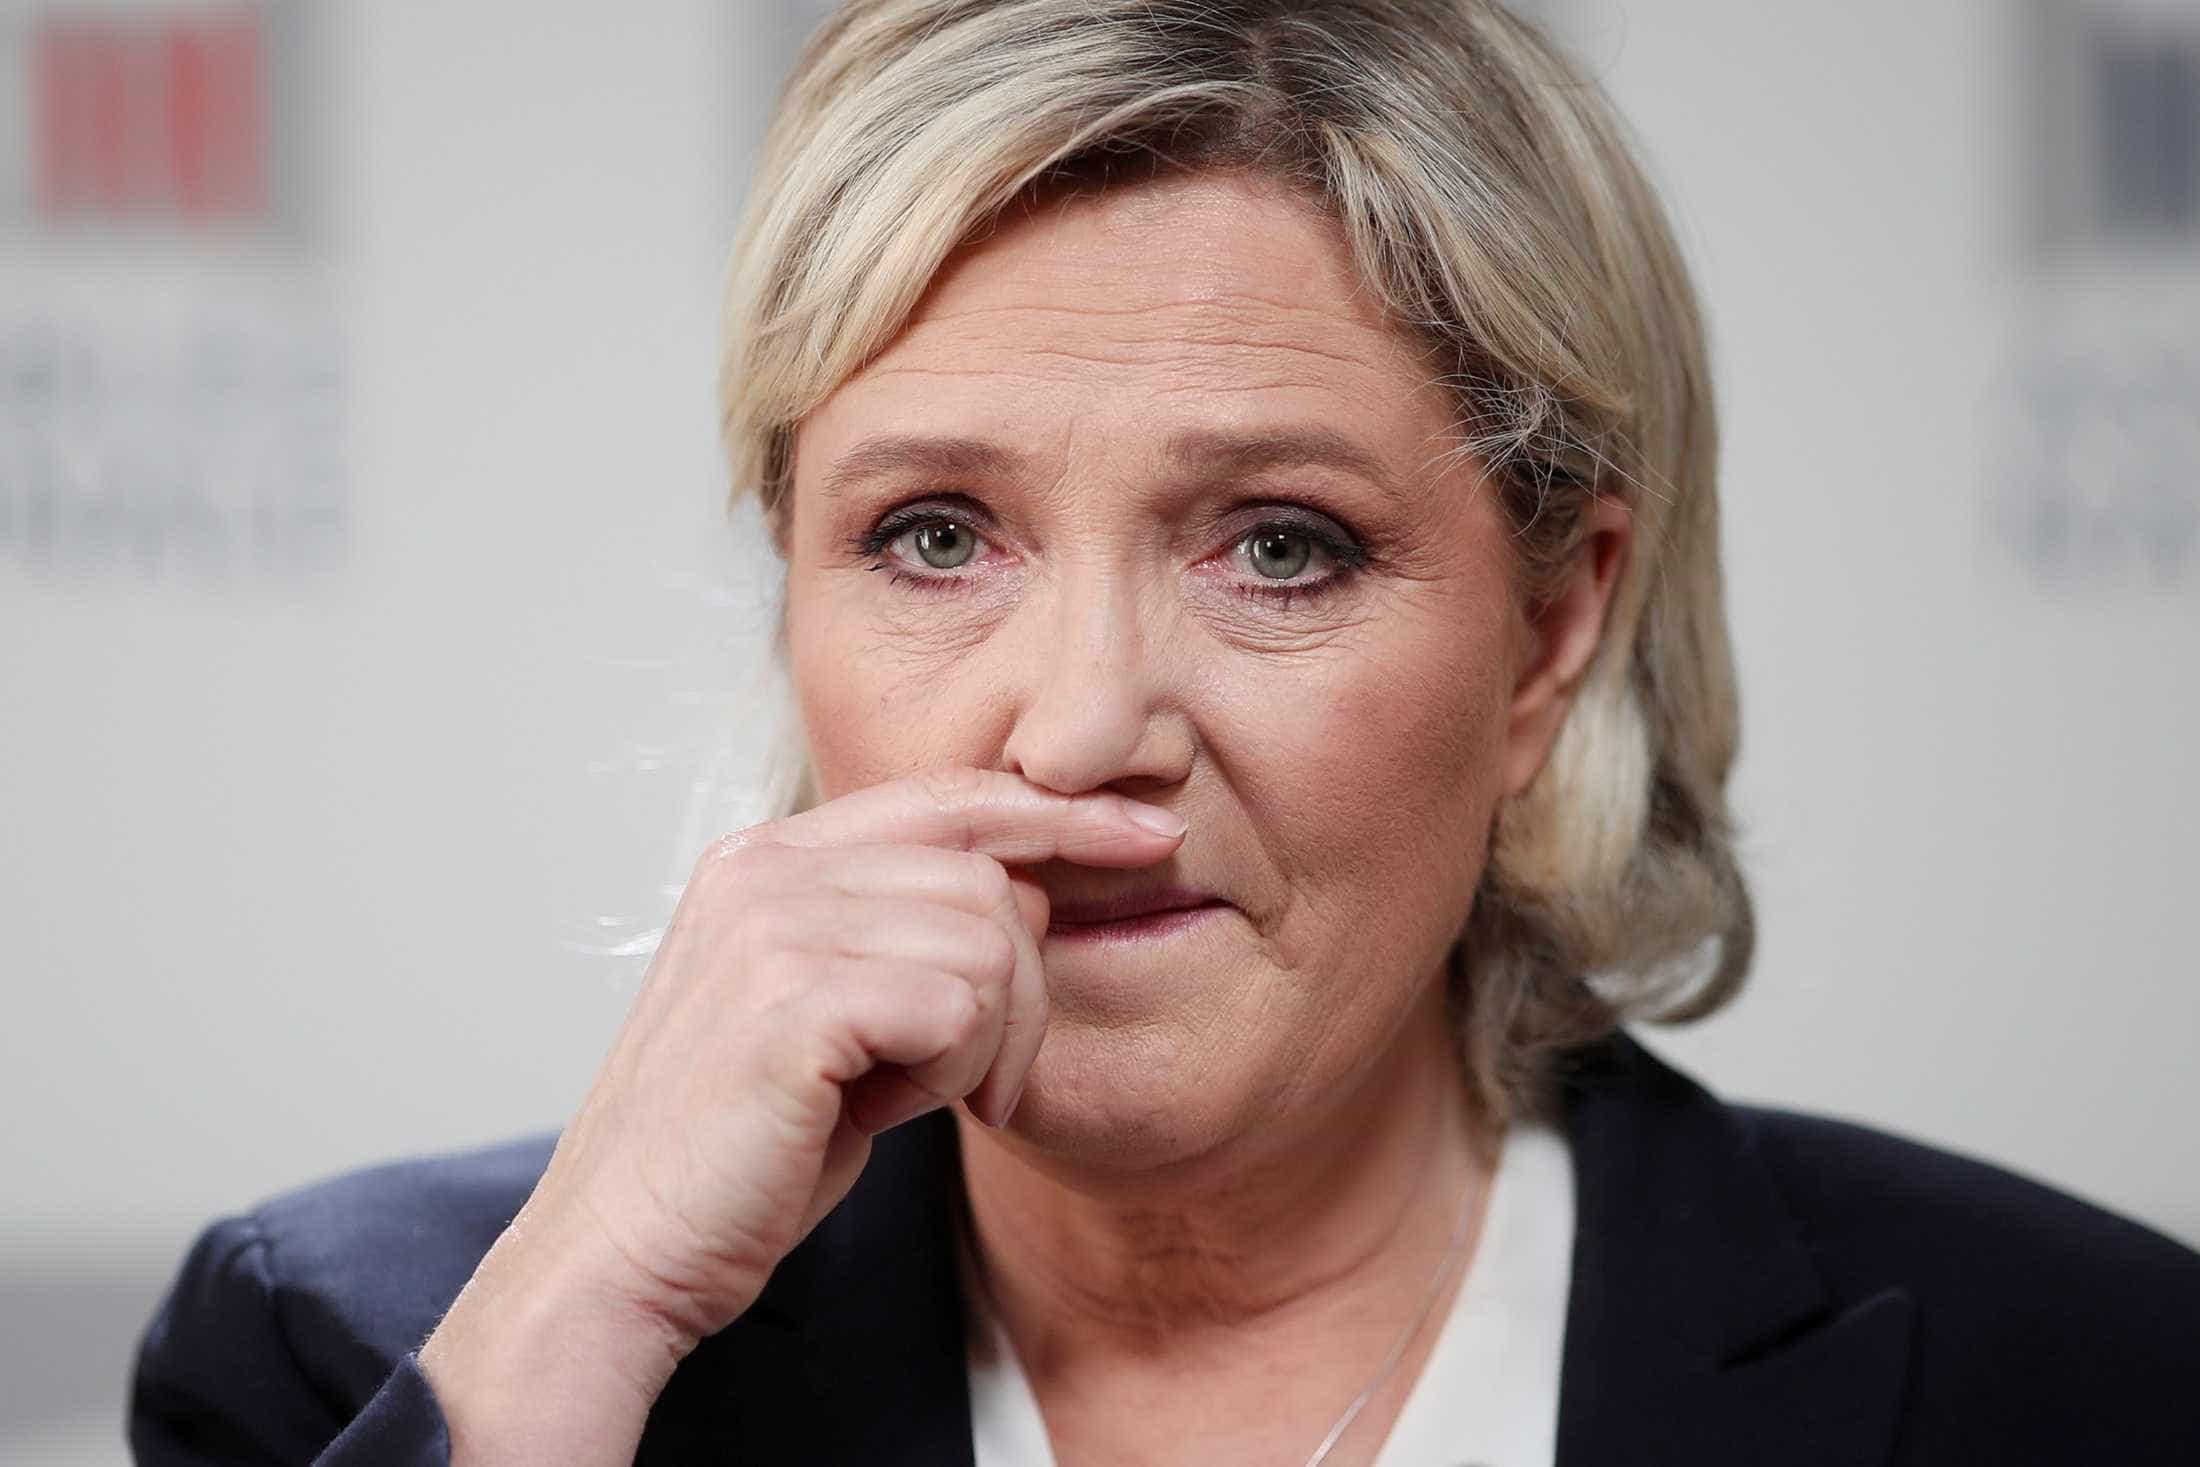 Marine Le Pen é condenada a devolver 300 mil euros à UE